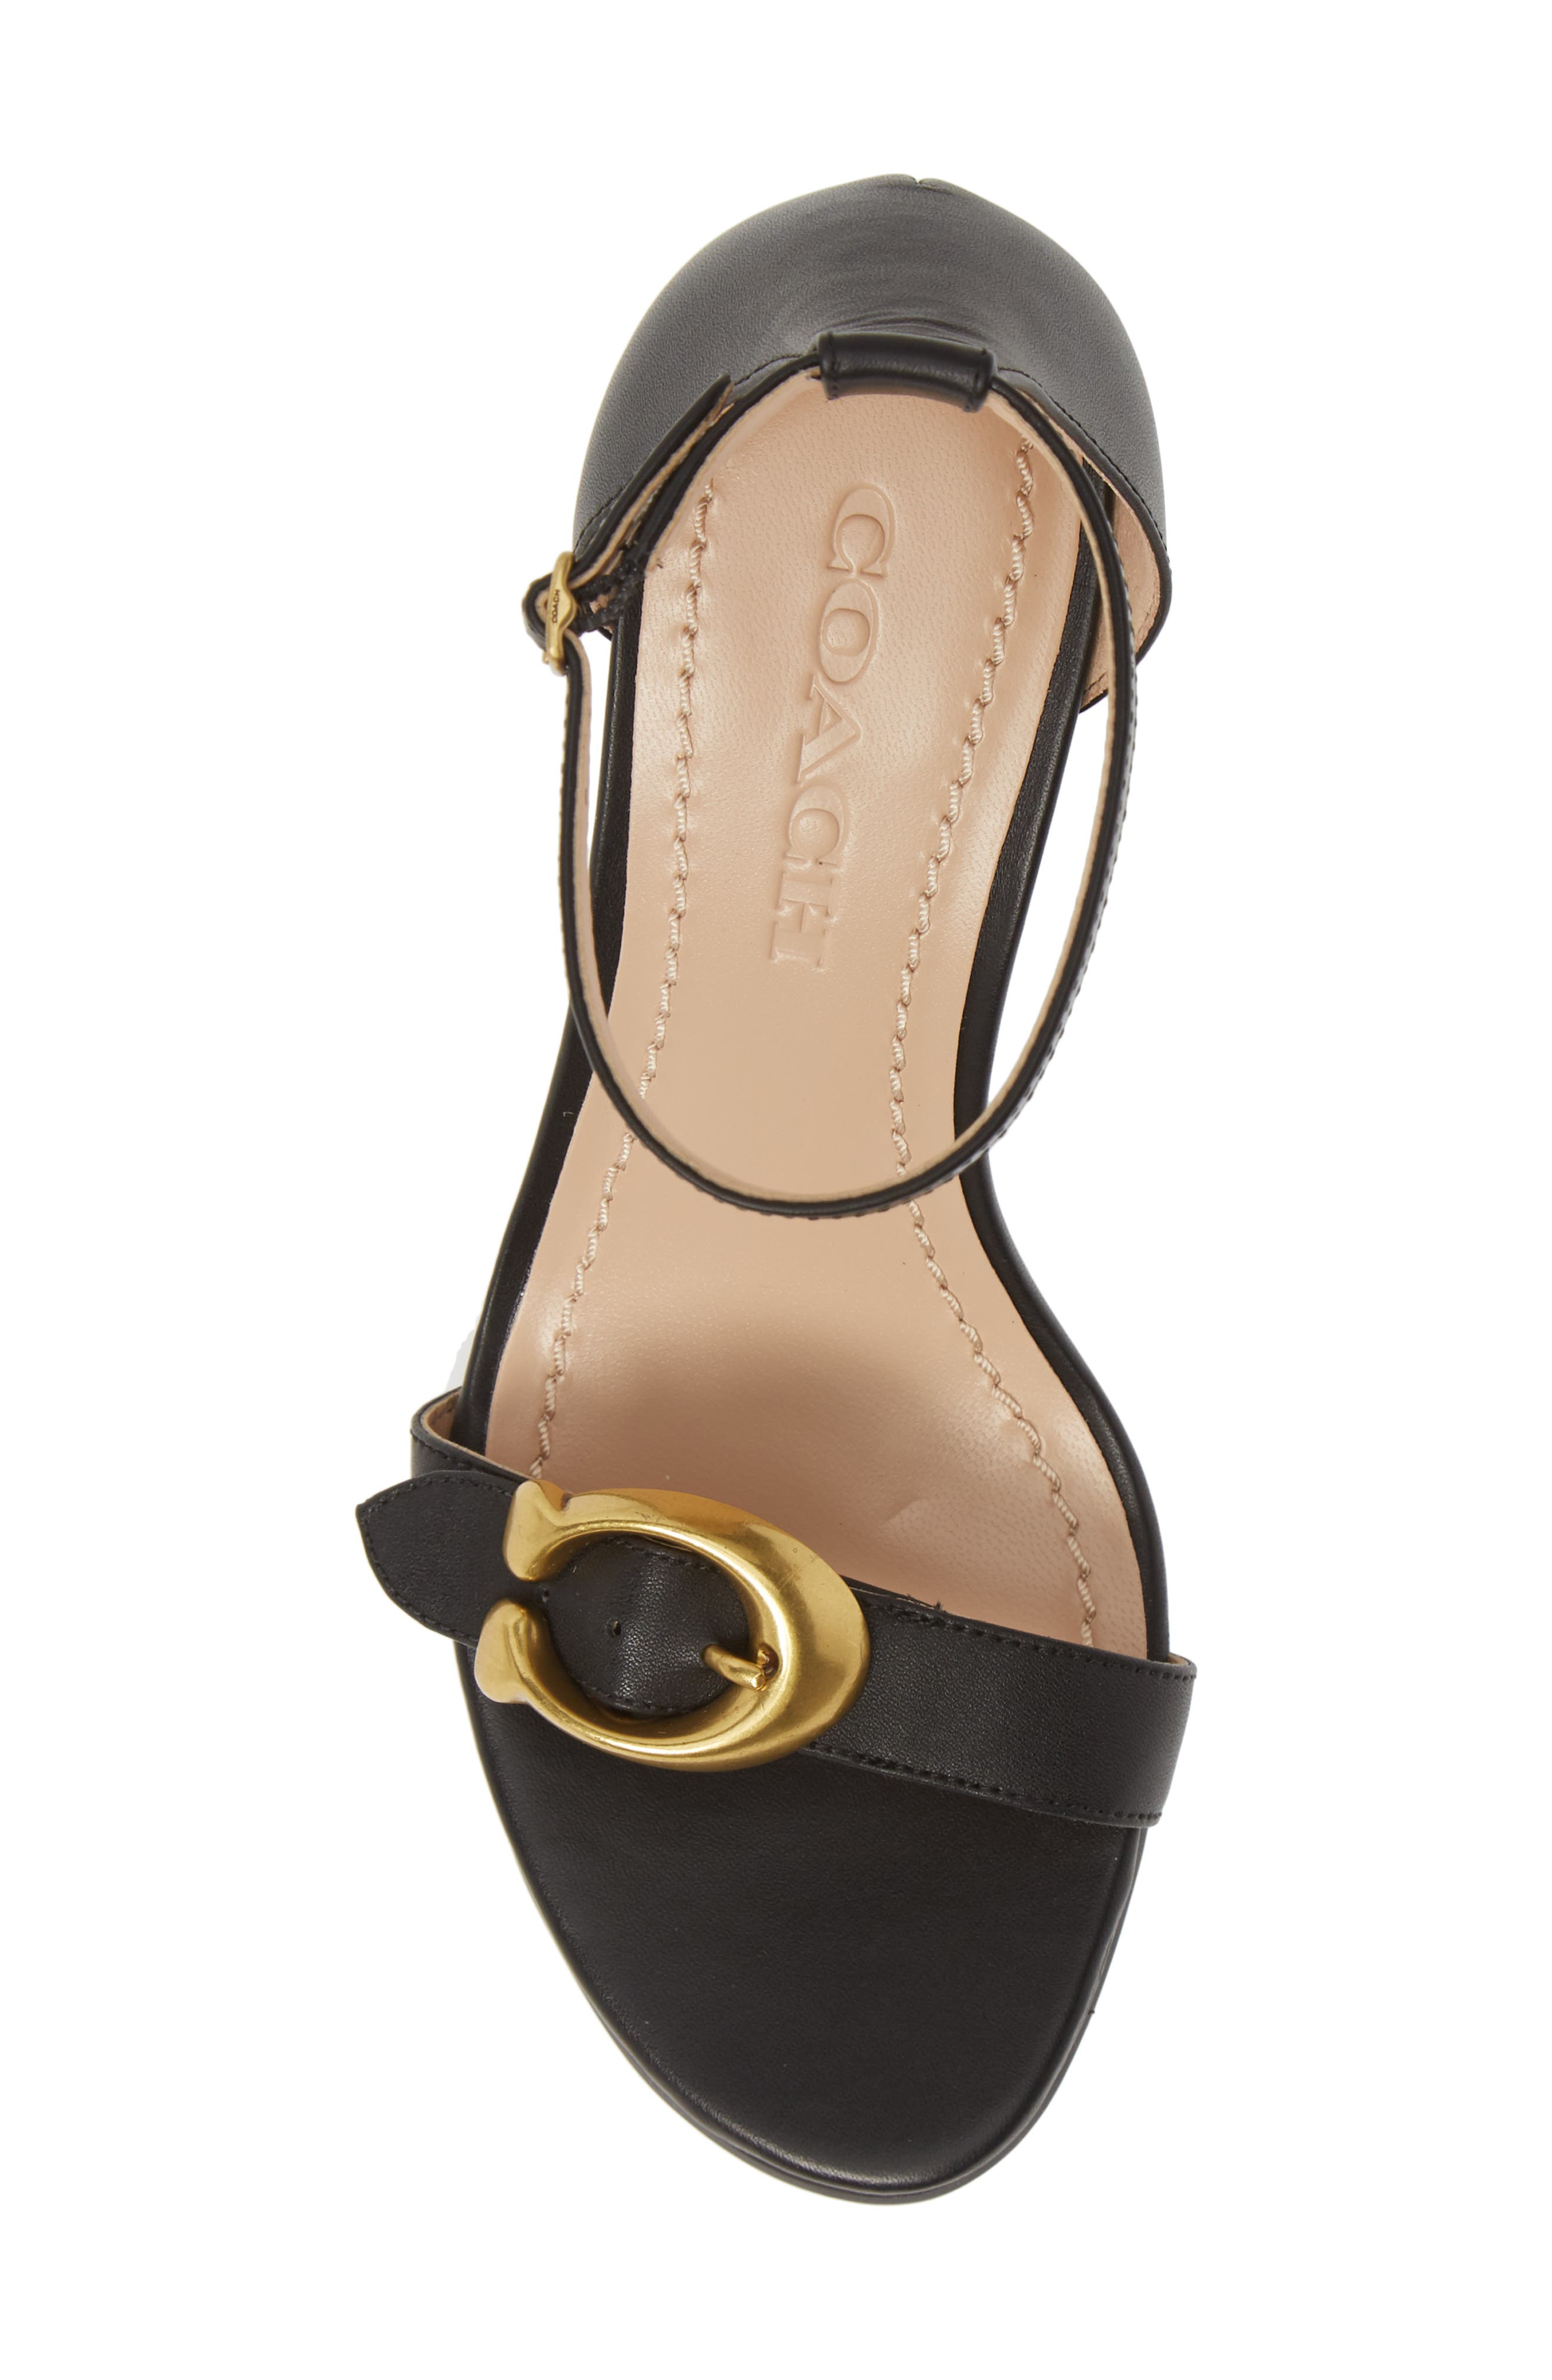 COACH, Odetta Wedge Ankle Strap Sandal, Alternate thumbnail 5, color, BLACK LEATHER